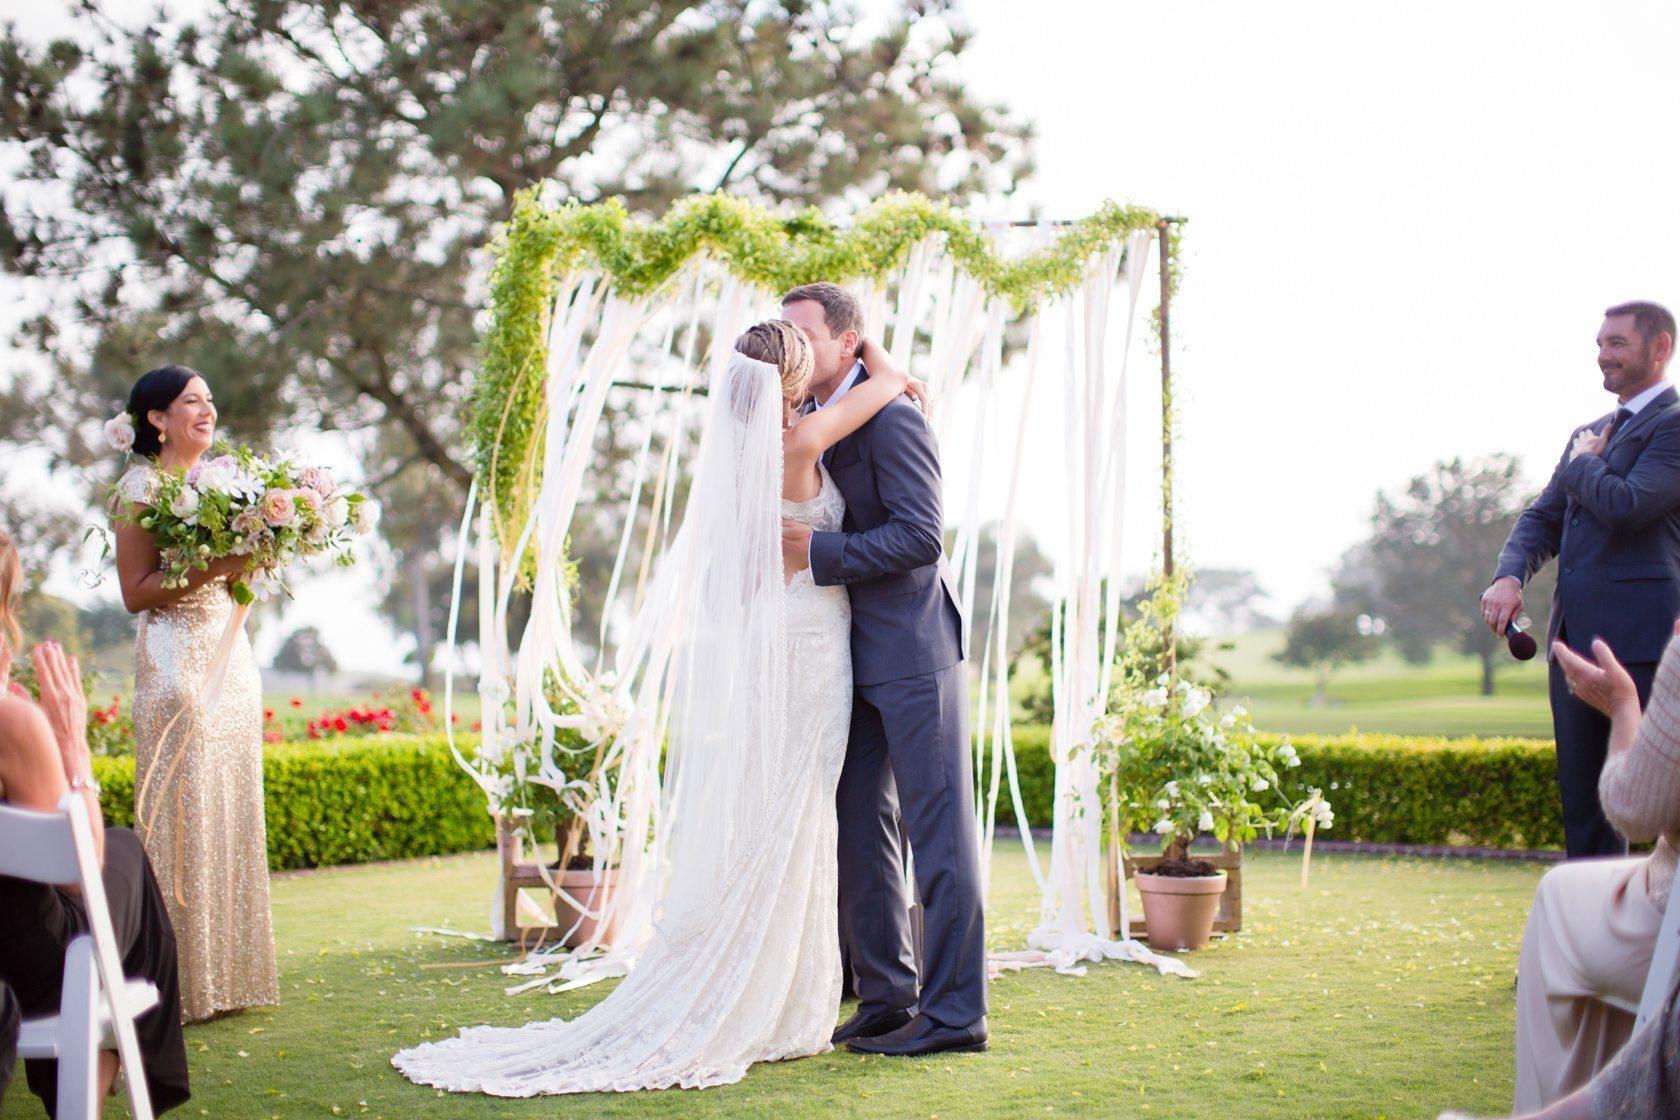 The_Lodge_at_Torrey_Pines_Wedding_064.jpg